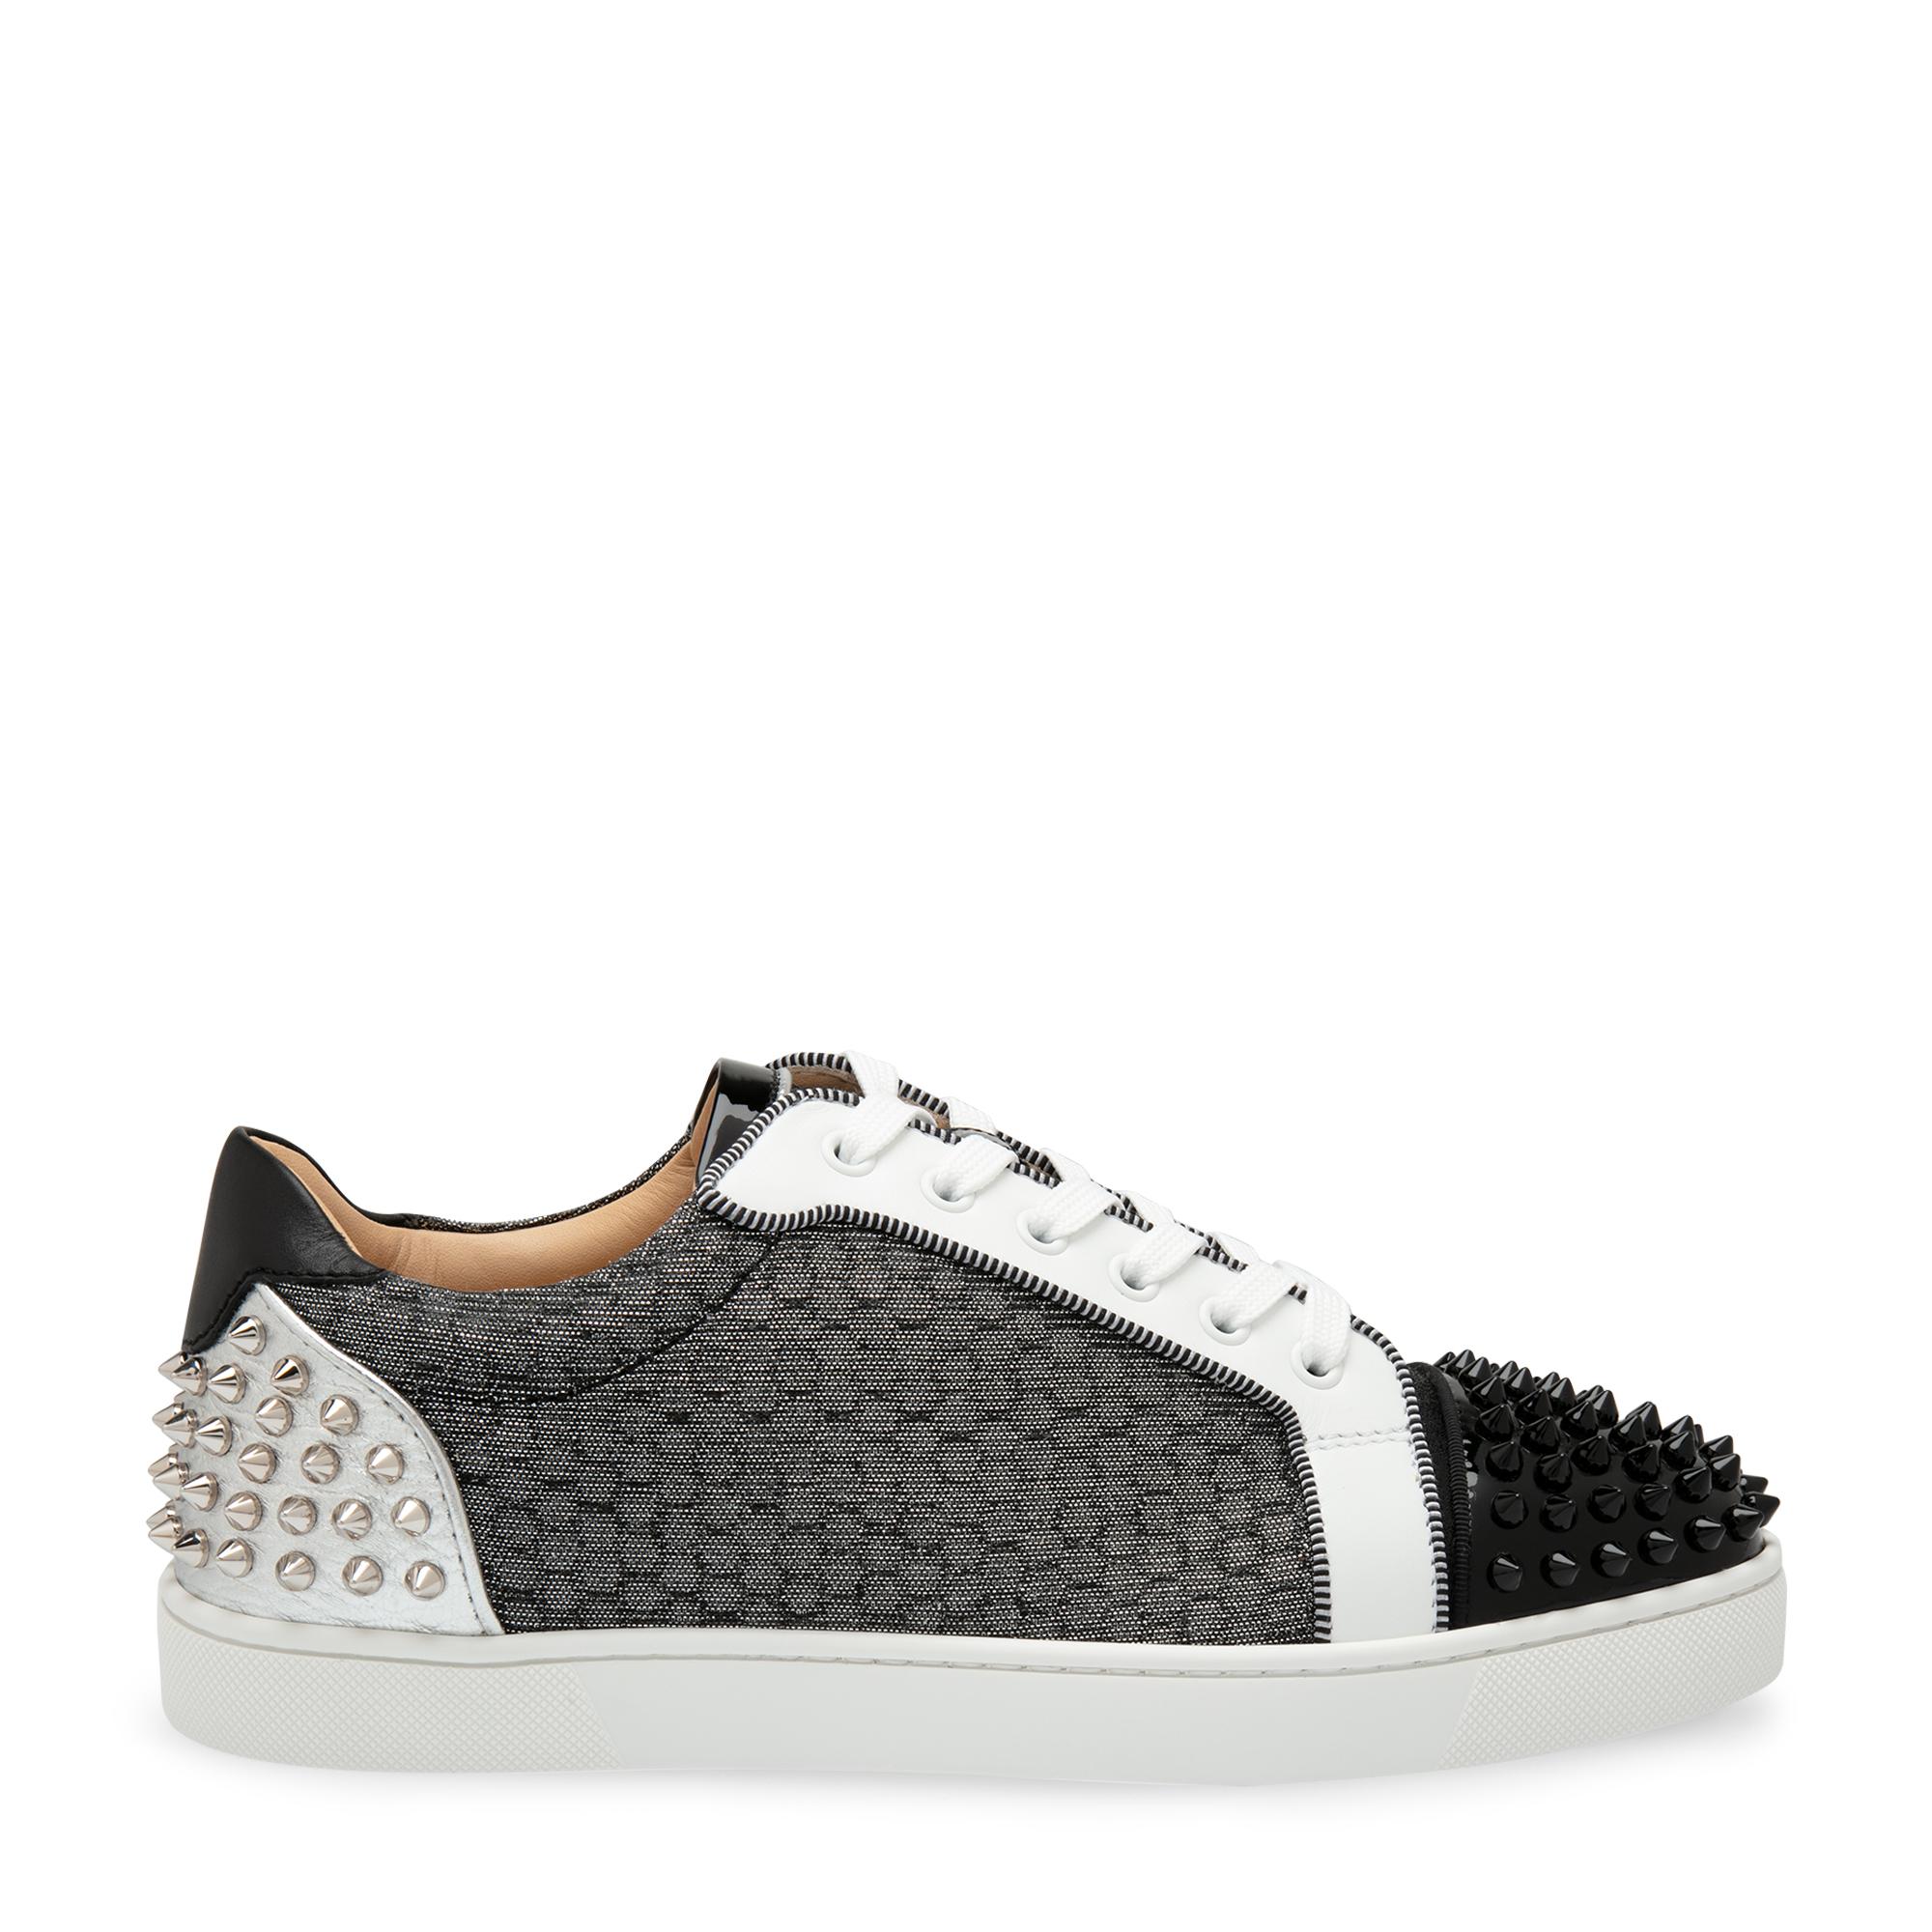 Louis junior spikes Orlato sneakers